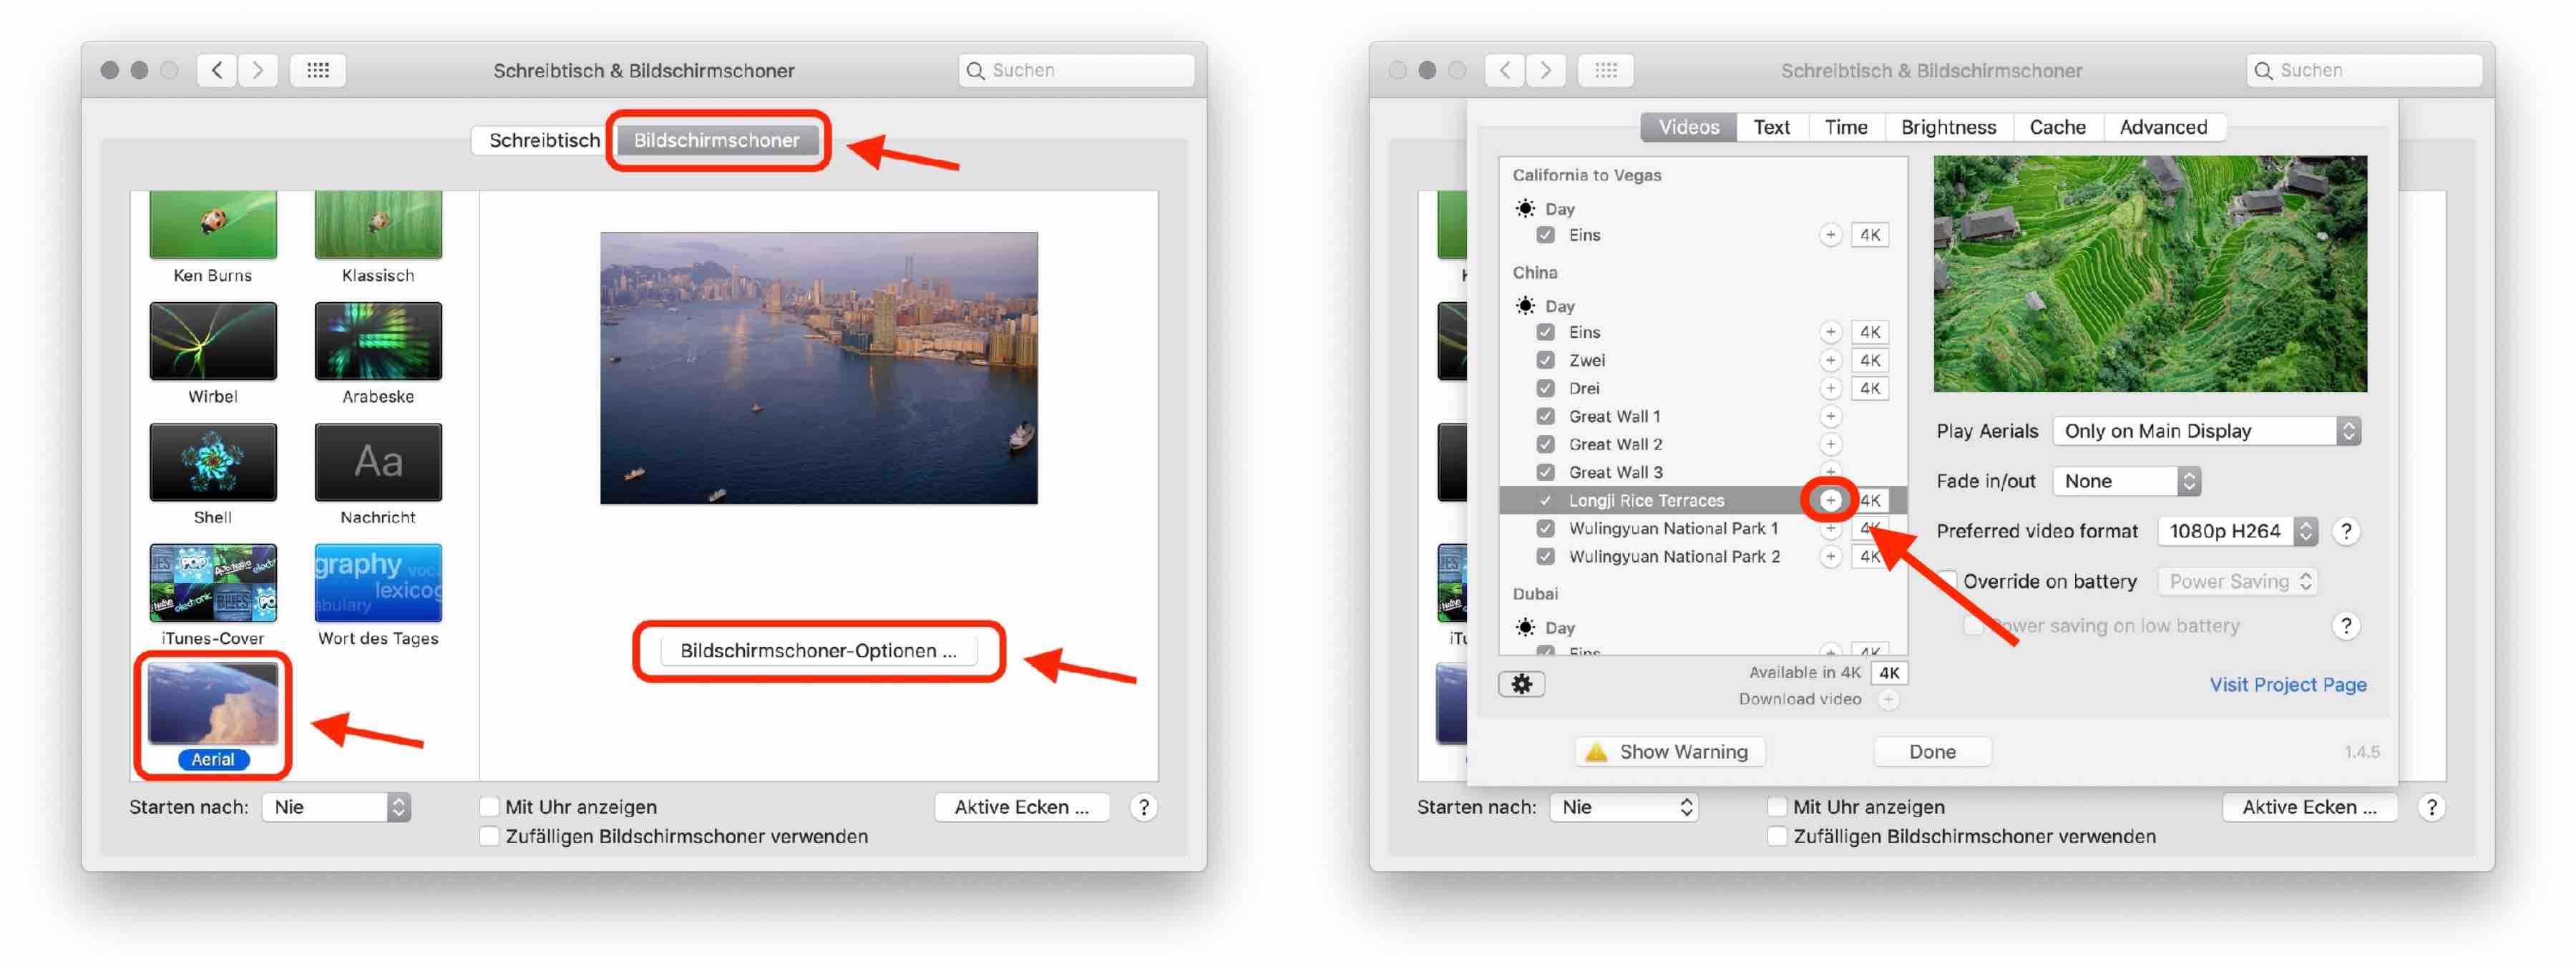 Aerial_Apple_TV_Mac_Screensaver1 Tipp: Die Apple-TV-Bildschirmschoner auf dem Mac nutzen